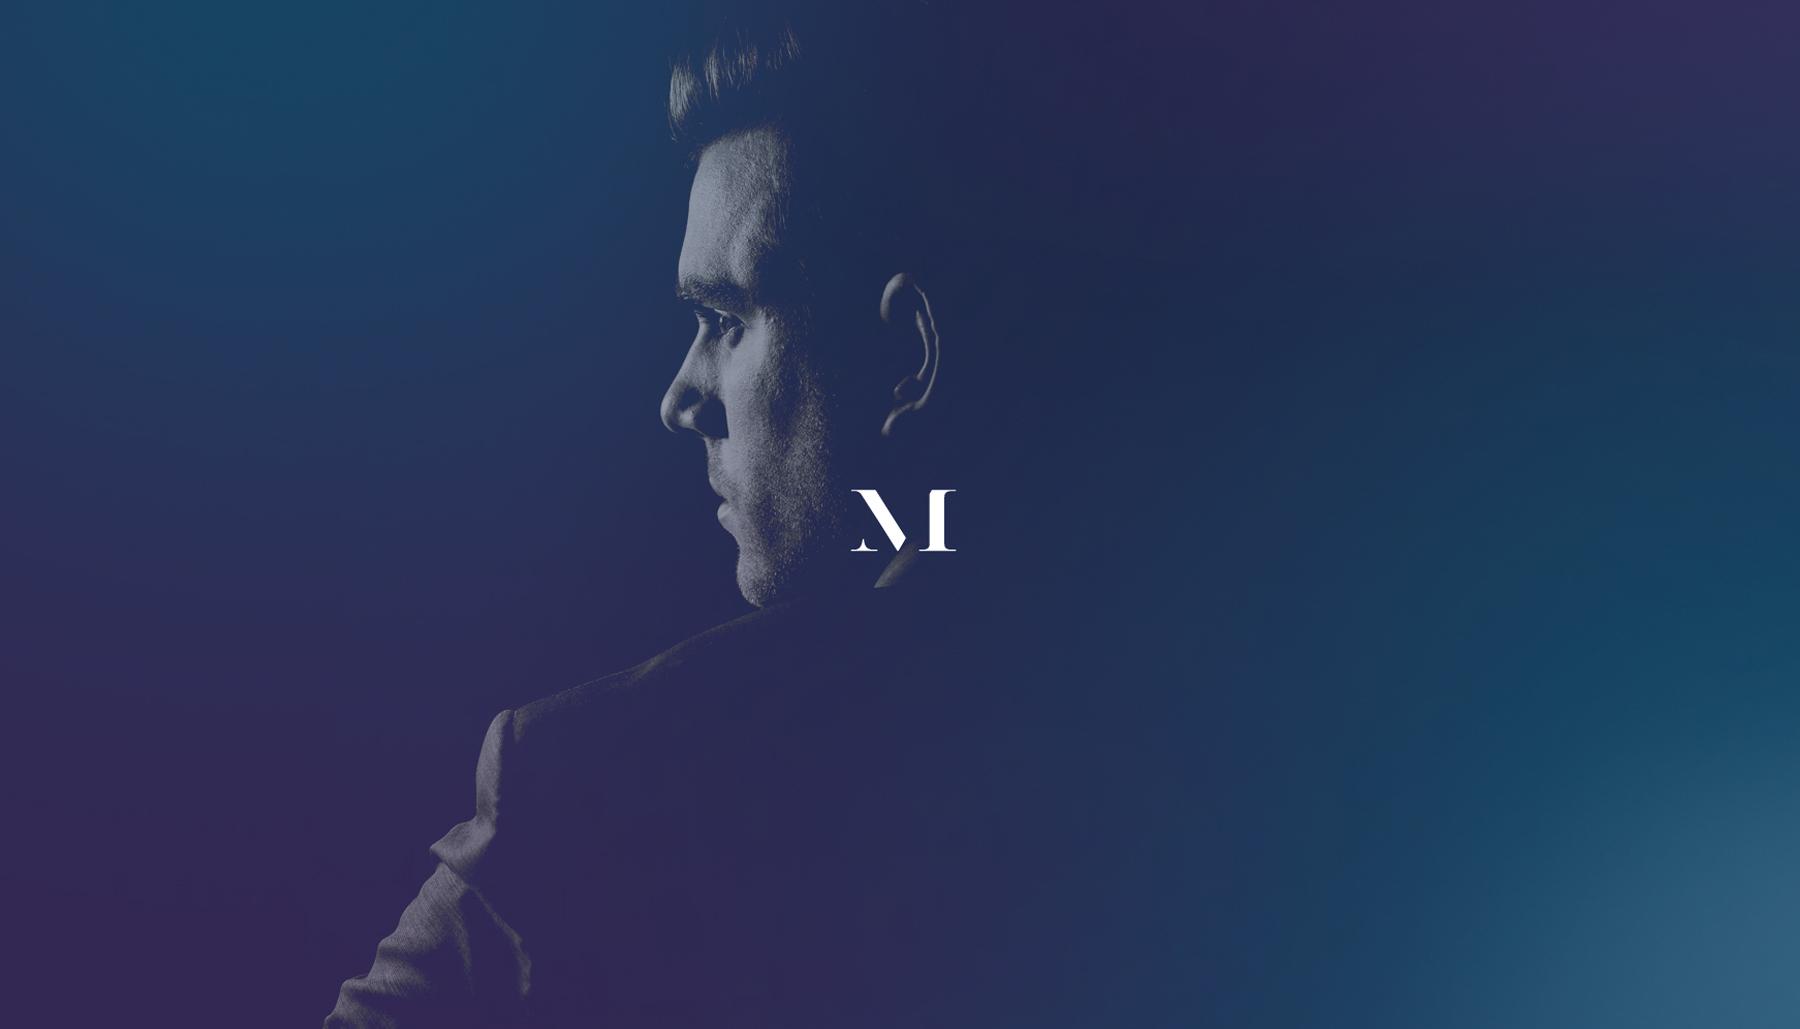 Elevate Branding - Miguel's Formal Wear, men's formal bespoke suits, retail fashion apparel in Virginia